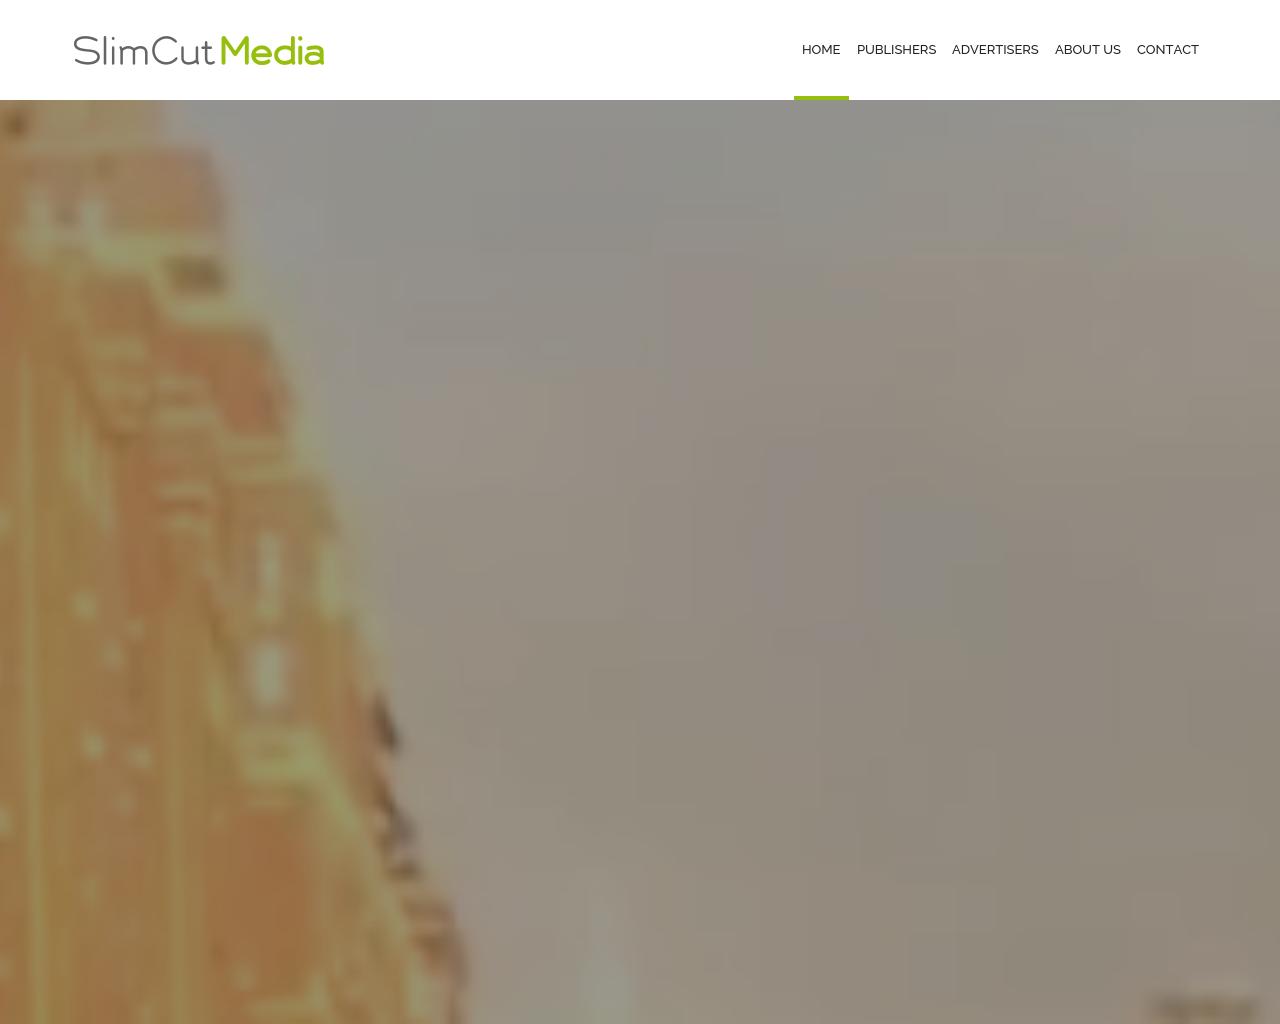 SlimCut-Media-Advertising-Reviews-Pricing